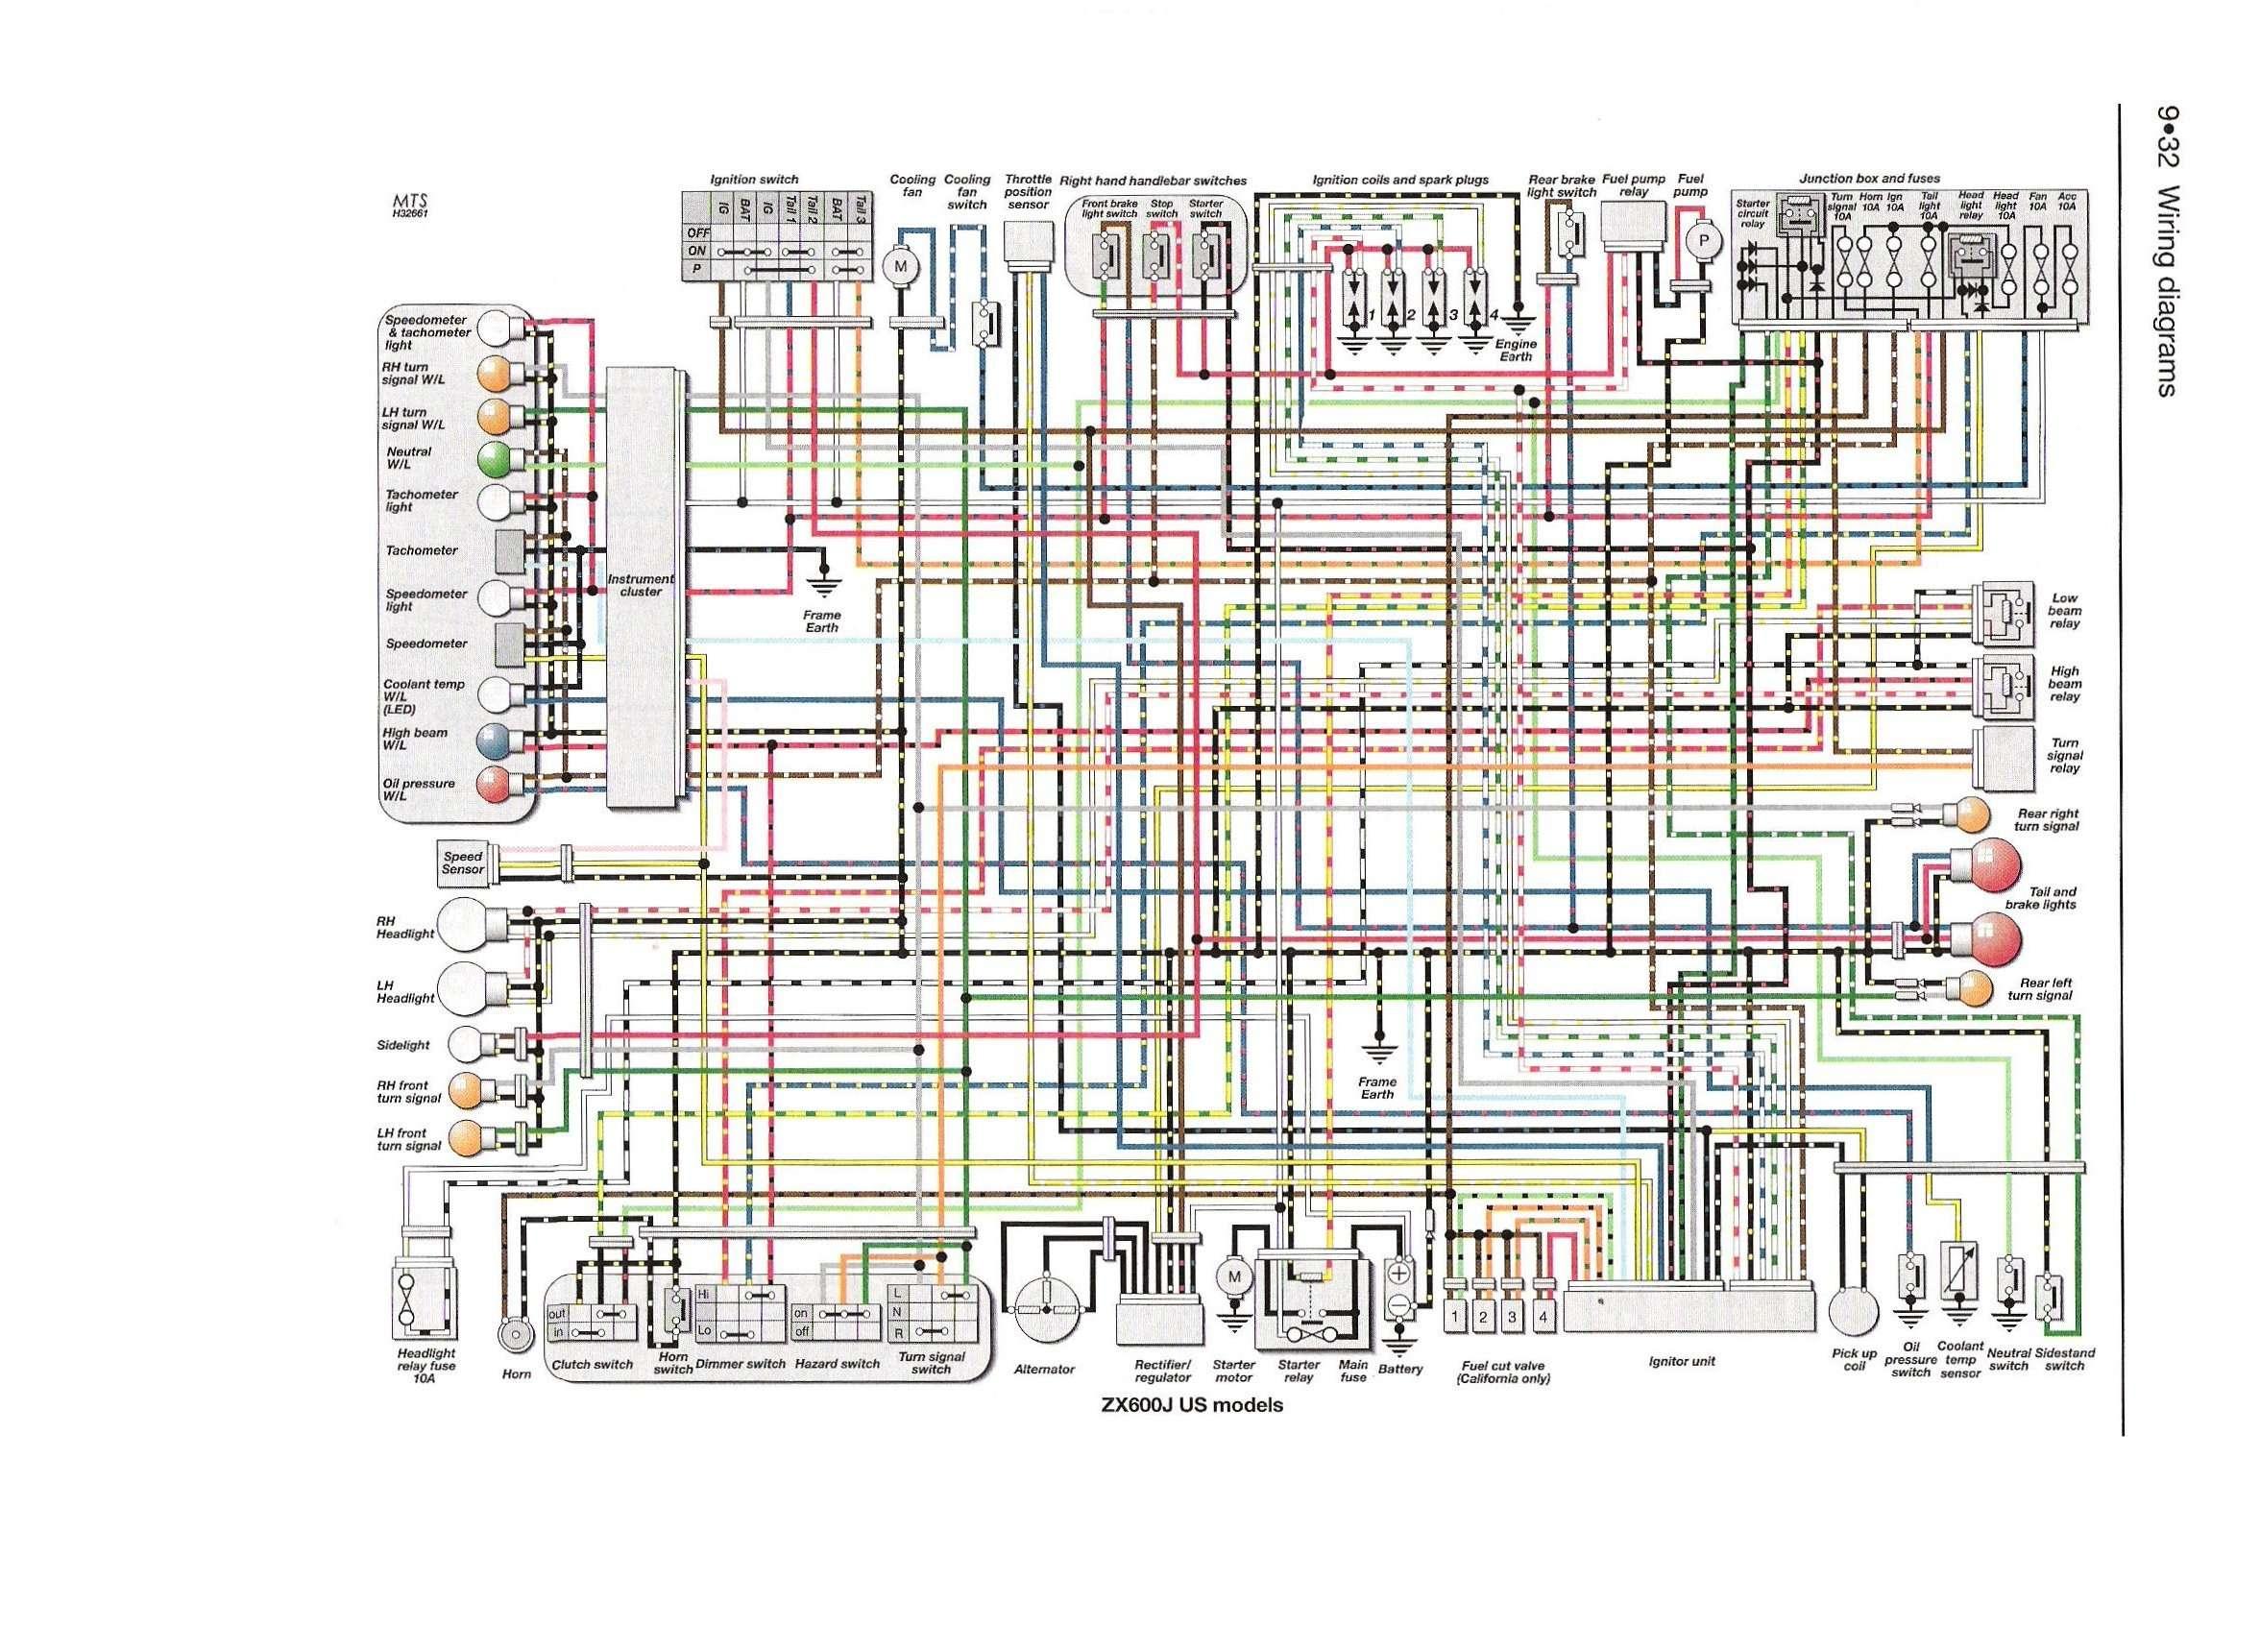 Kawasaki 2003 636 Wiring Diagram - Wiring Diagram All suck-core -  suck-core.huevoprint.it | 2015 Zx14 Fuse Diagram |  | Huevoprint